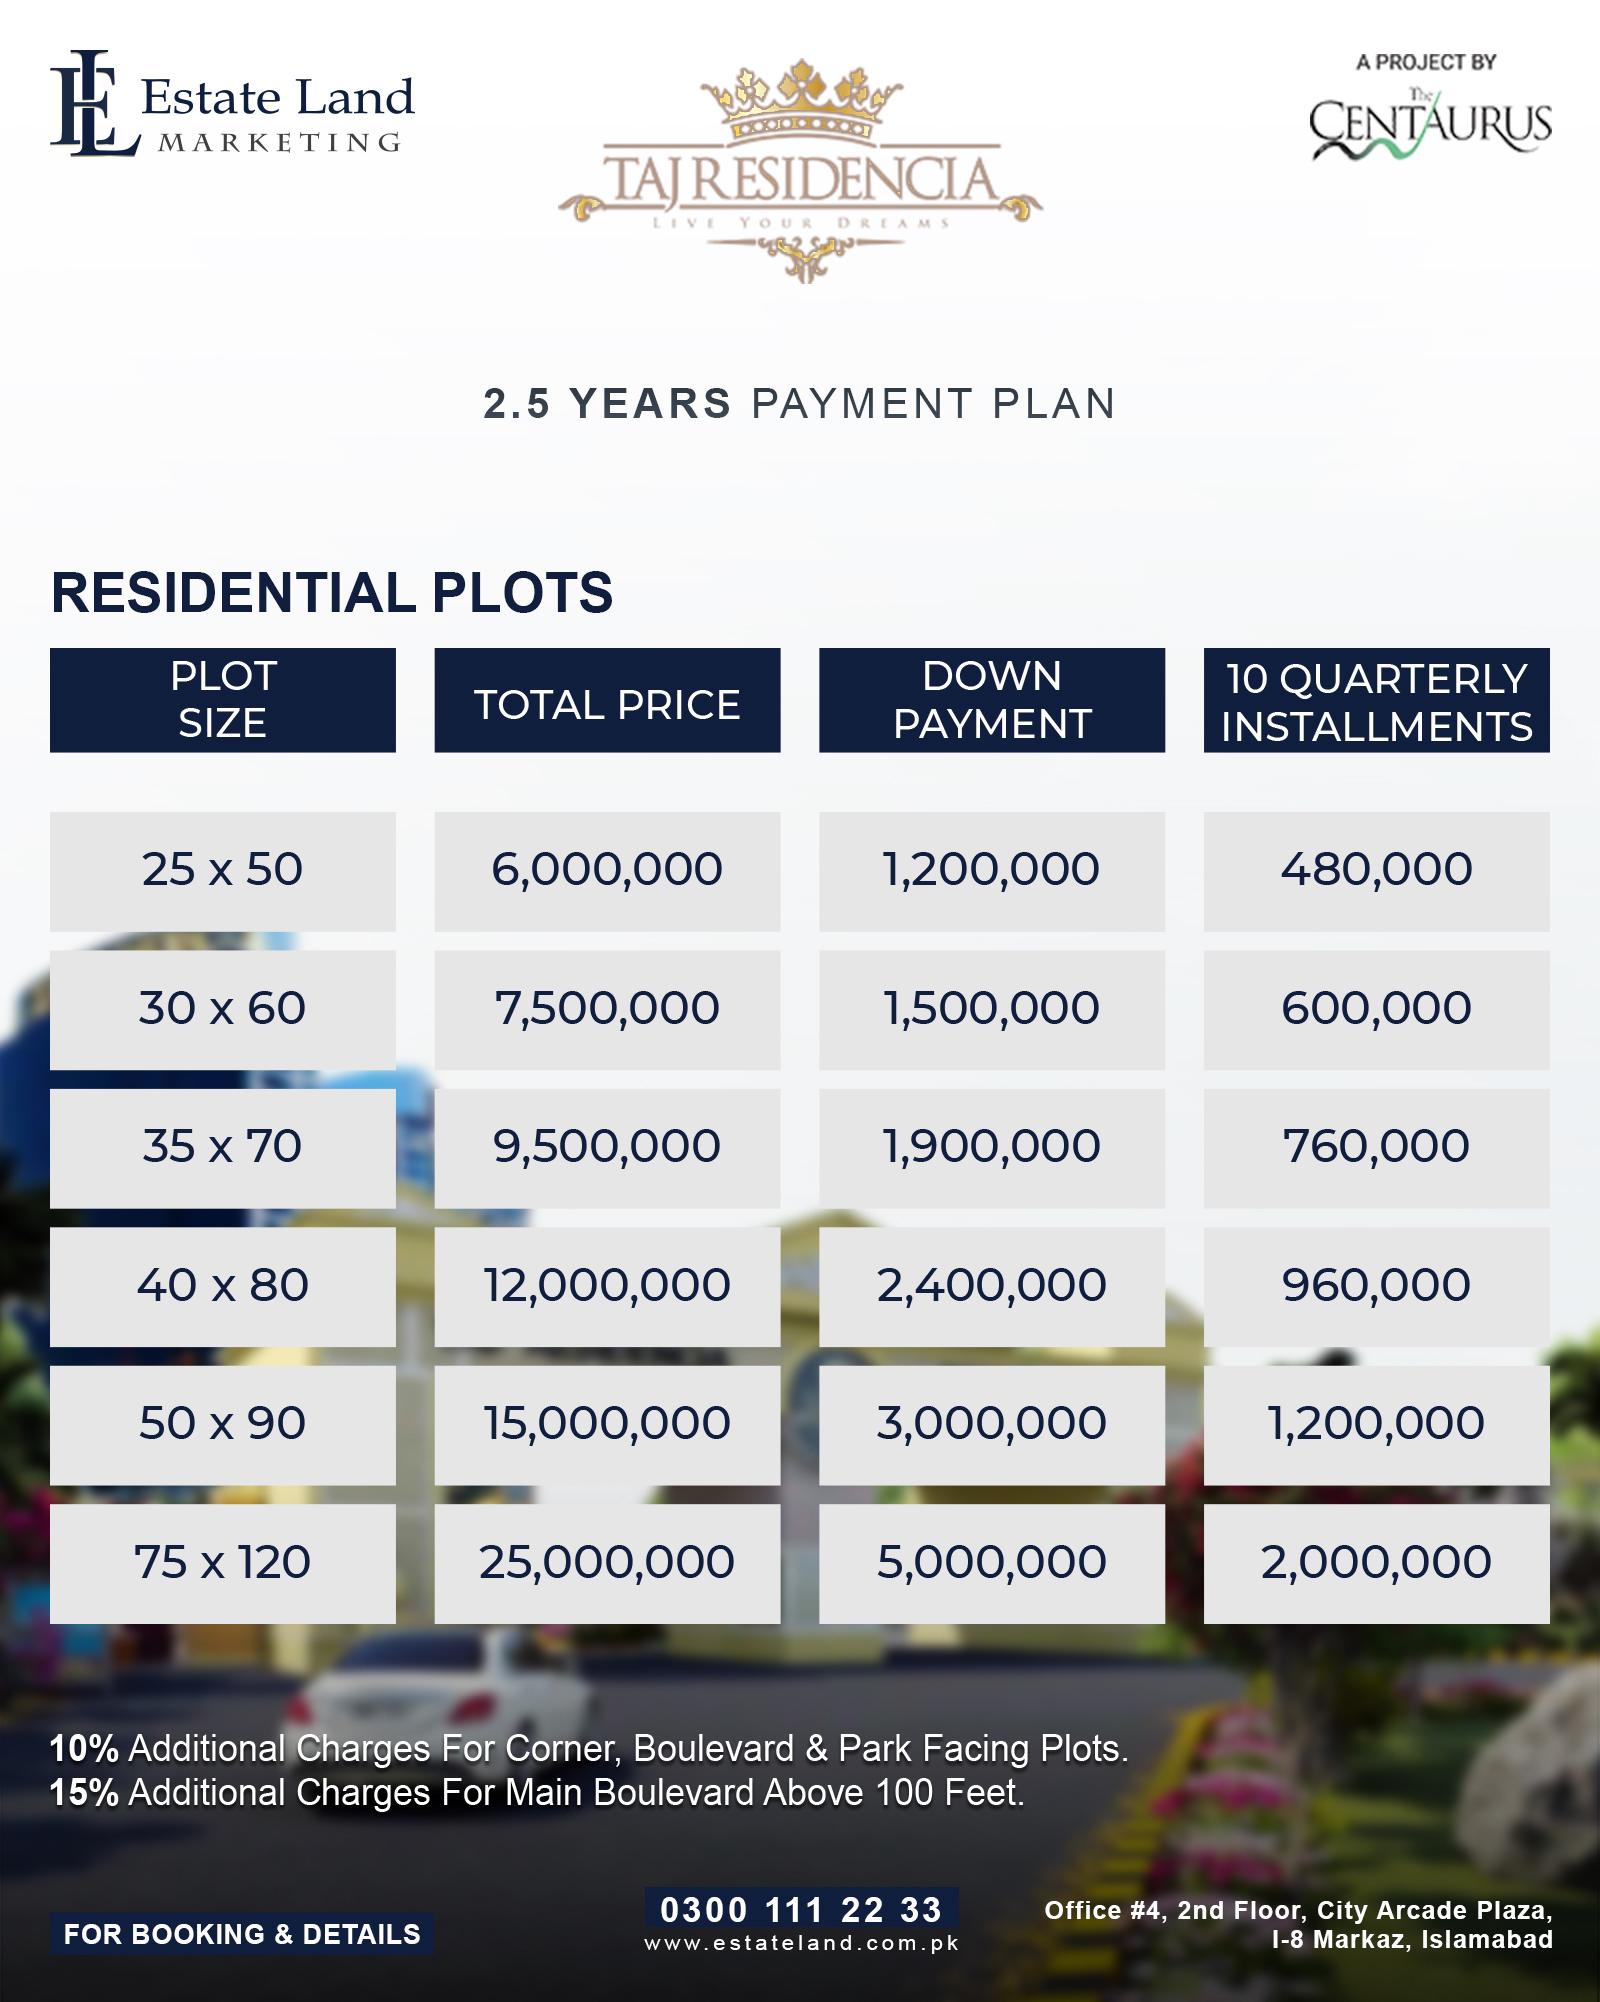 2.5 year payment plan of taj residencia